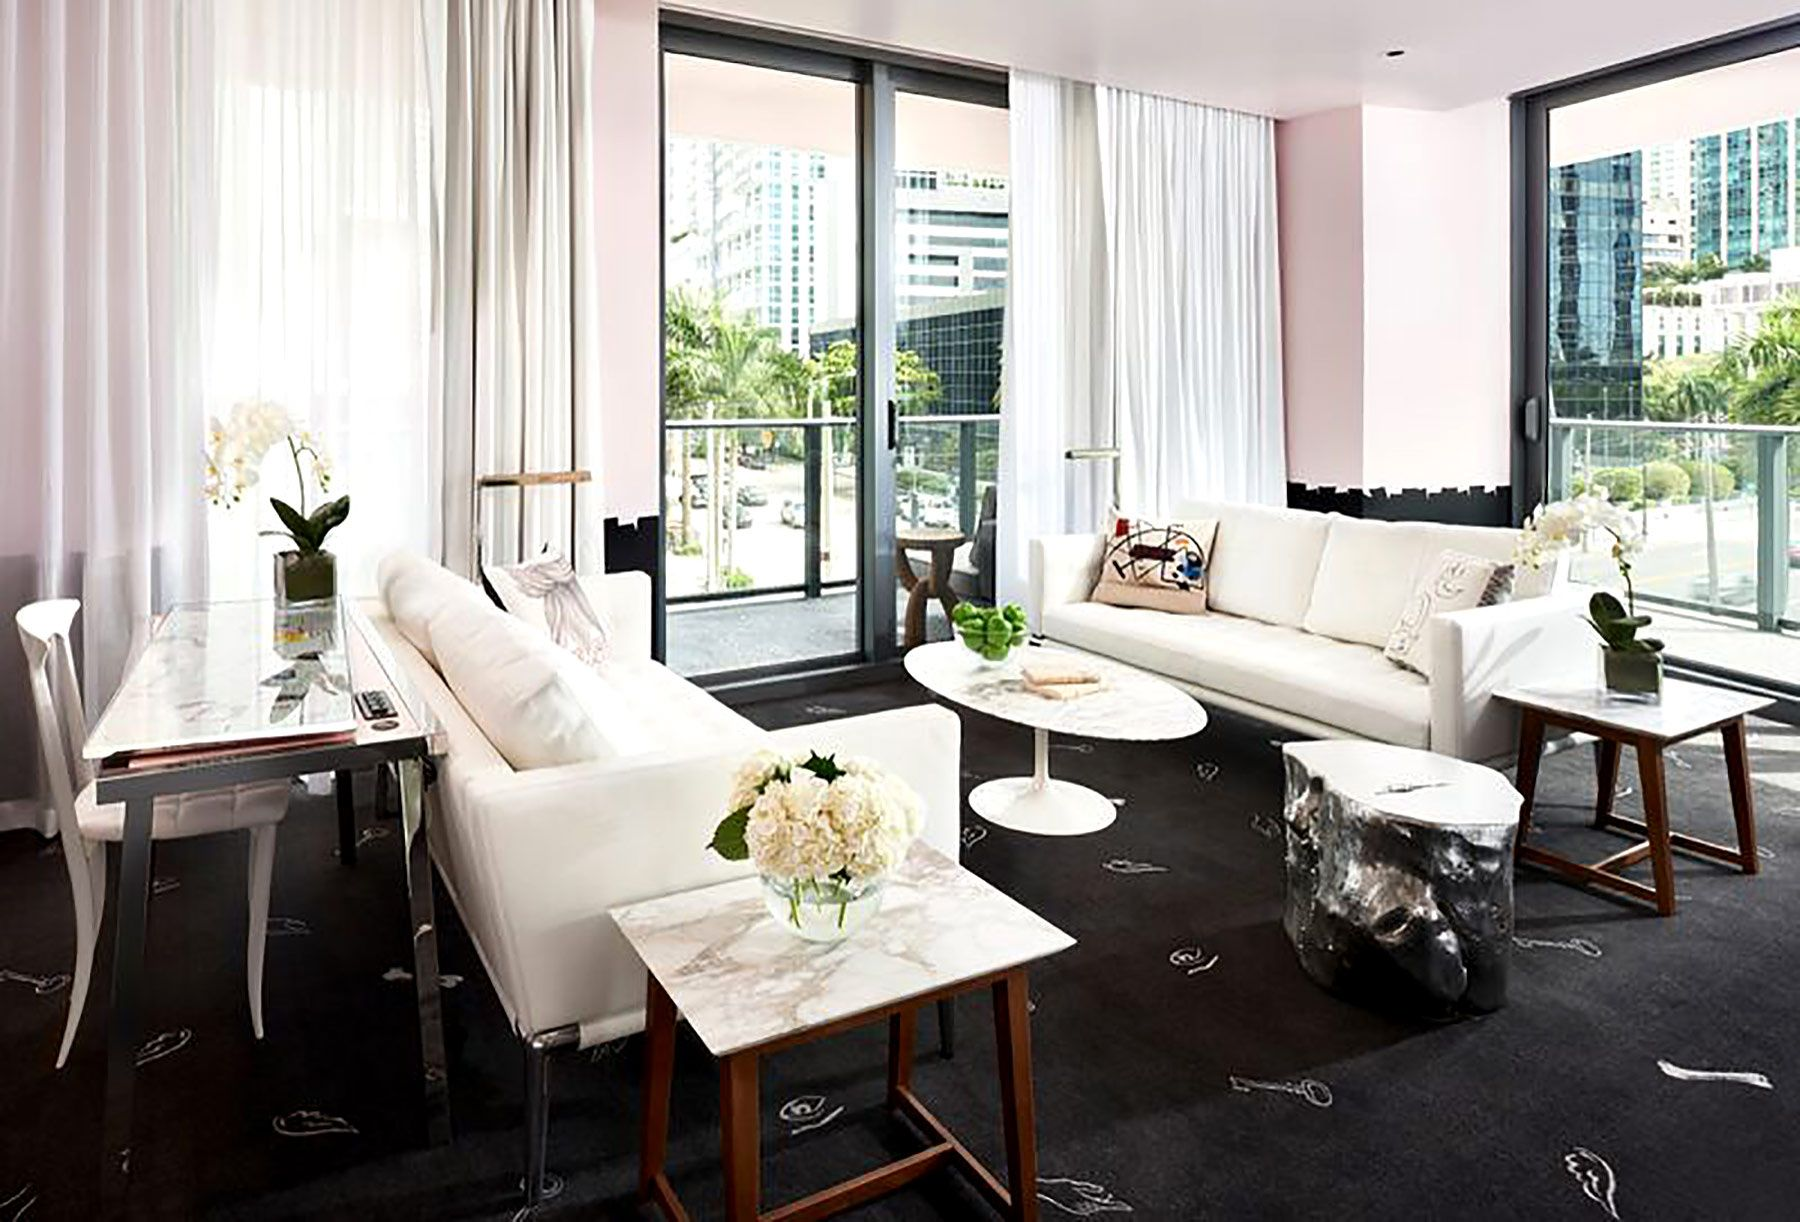 Dise O Sibarita Hotel Sls Brickell En Miami Ad Mx Sergios  # Muebles Nova Luxe Zacatecas